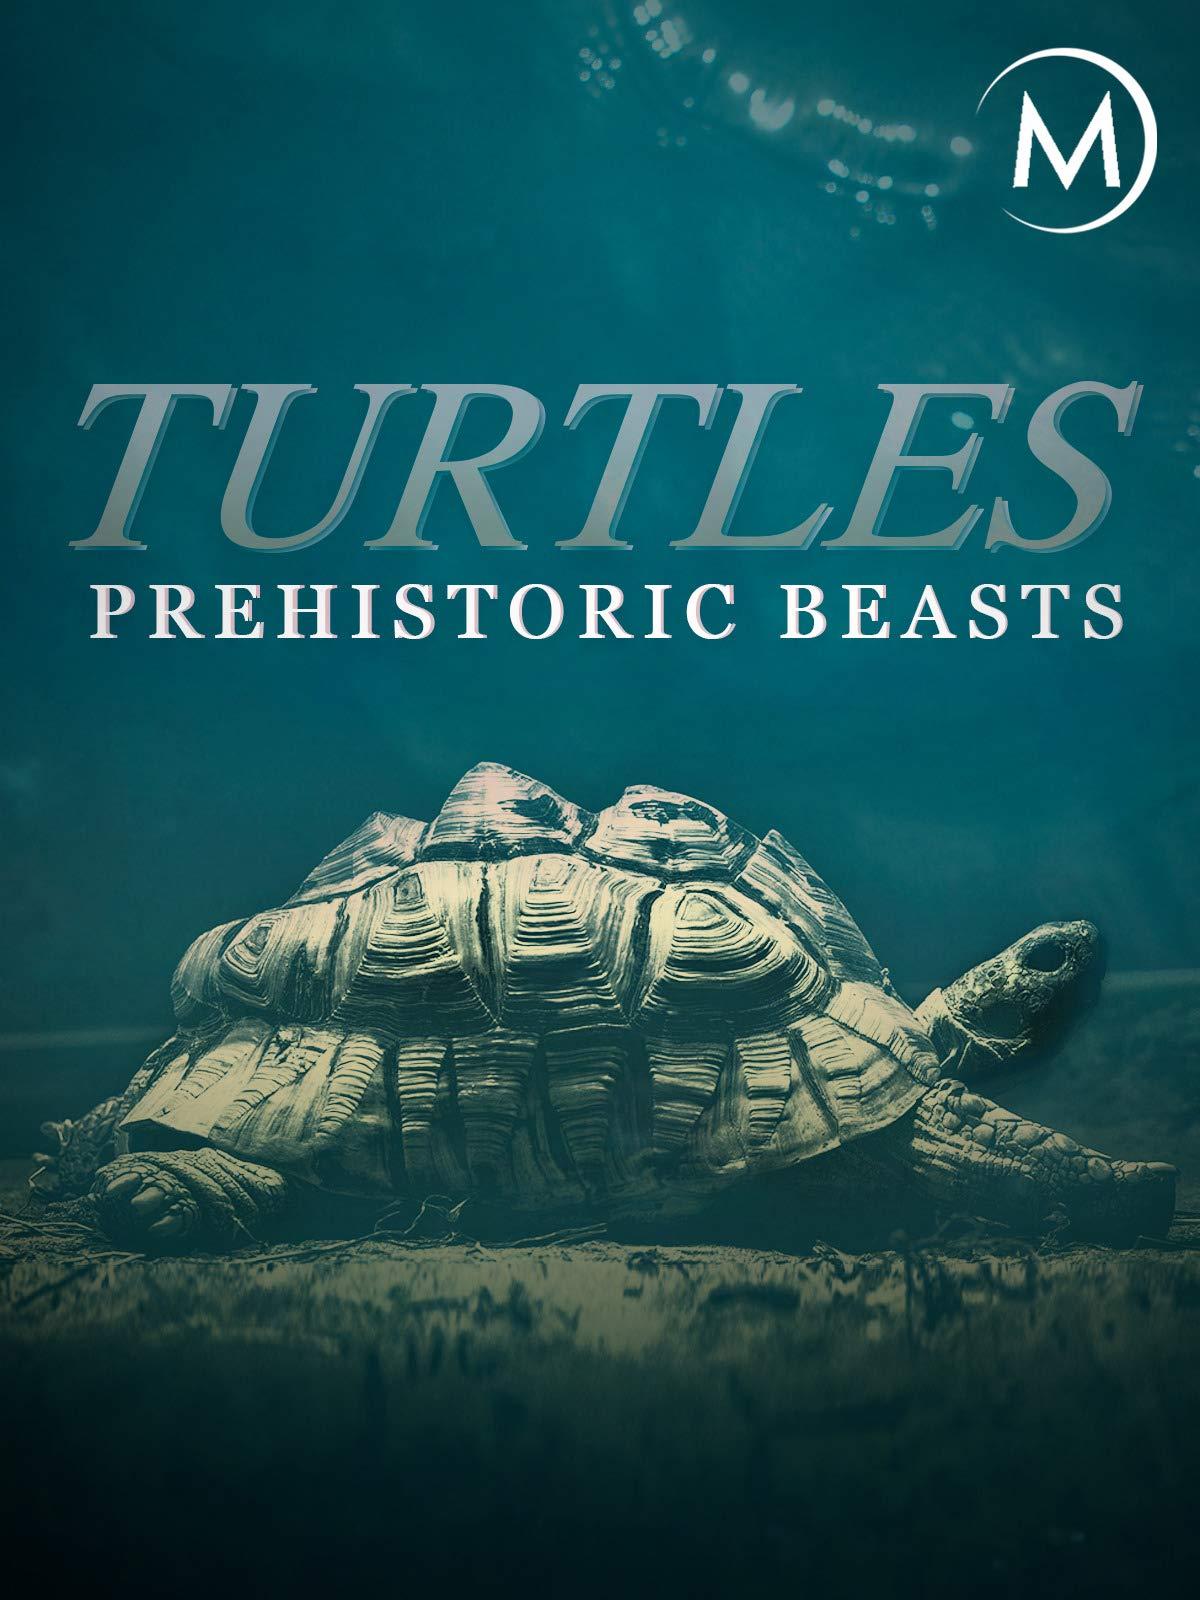 Turtles: Prehistoric Beasts on Amazon Prime Instant Video UK